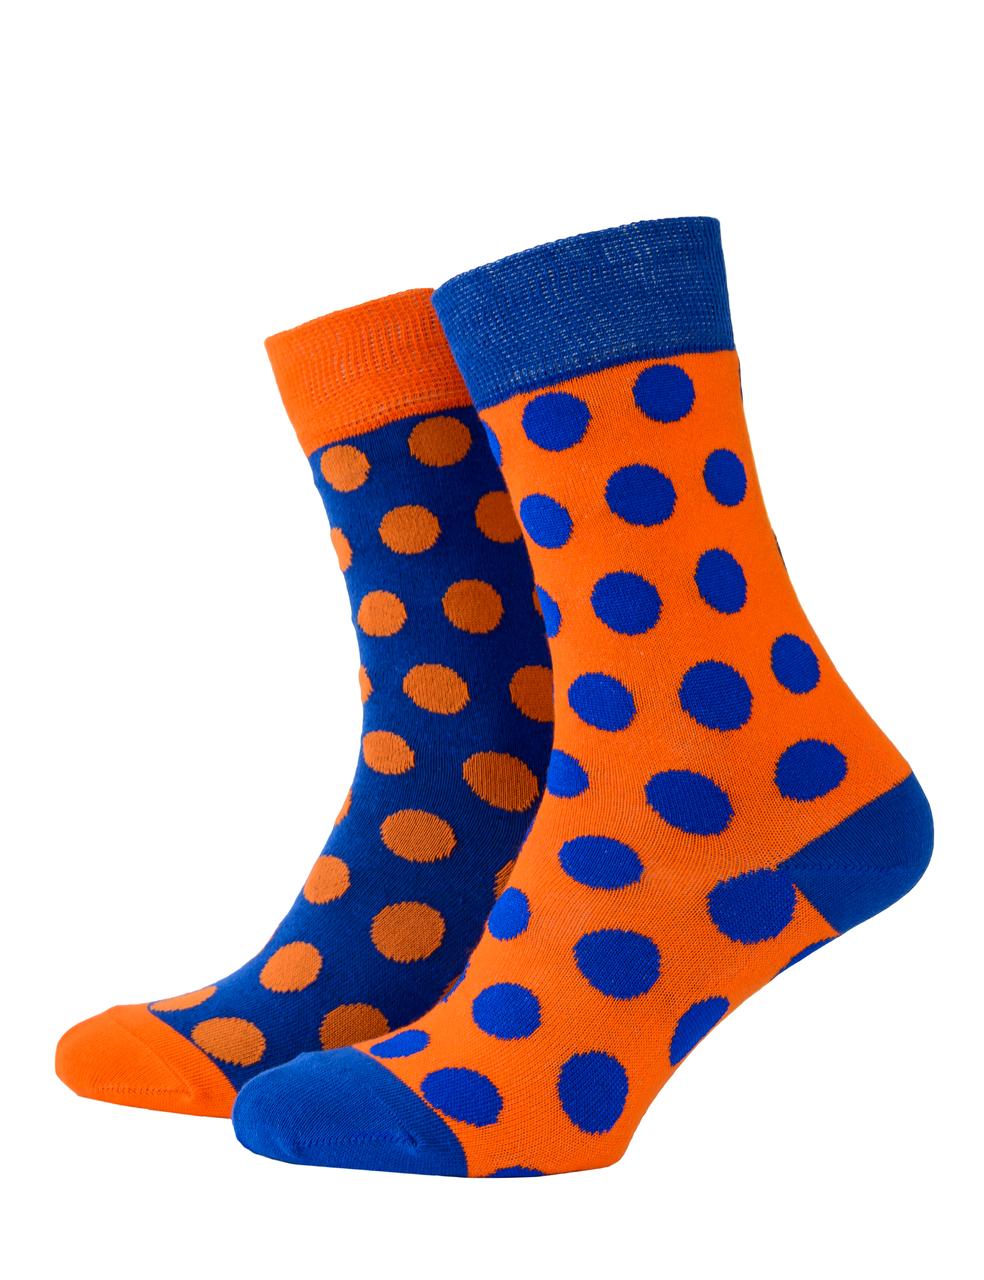 Носки Mushka Orange mood (ORA001) 36-39